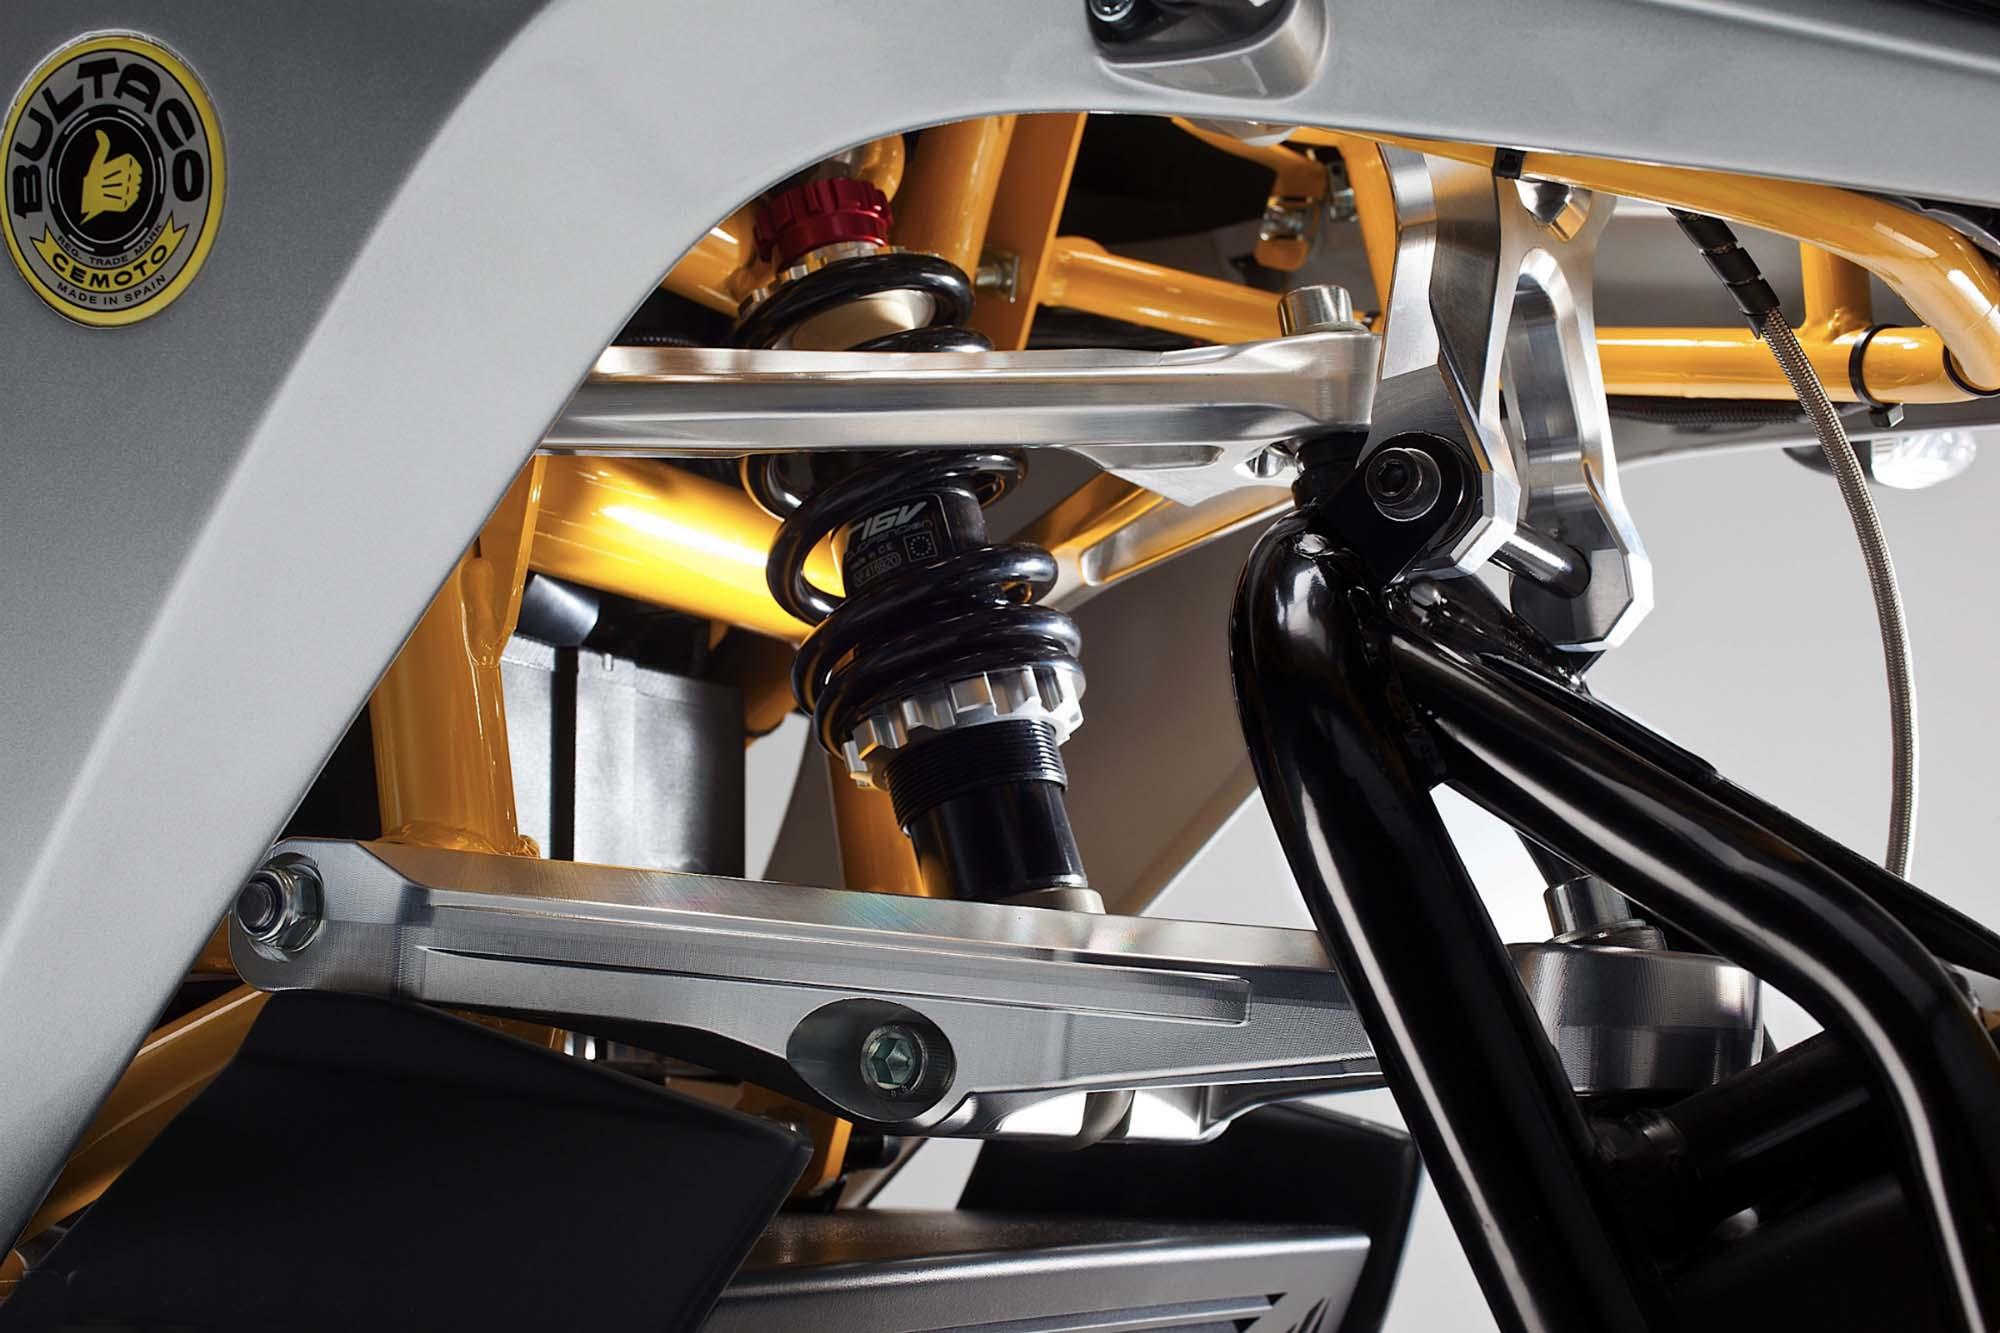 La sportive verte du futur - Page 15 Bultaco-Rapitan-Electric-street-bike-04